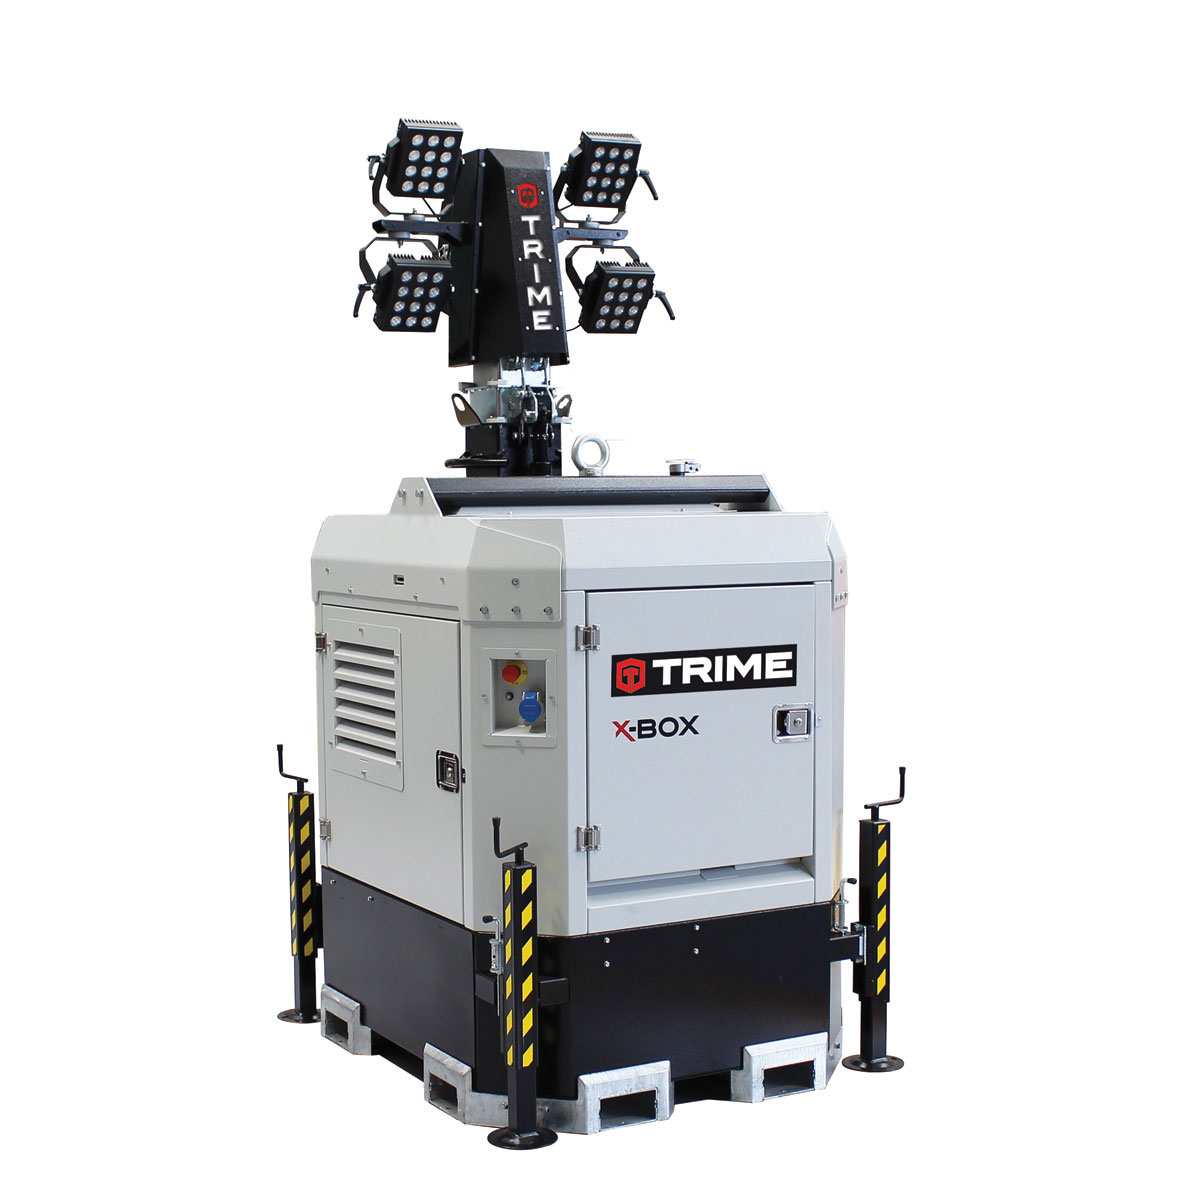 belysningsmast-led-x-box-4x150W-48V-stangd